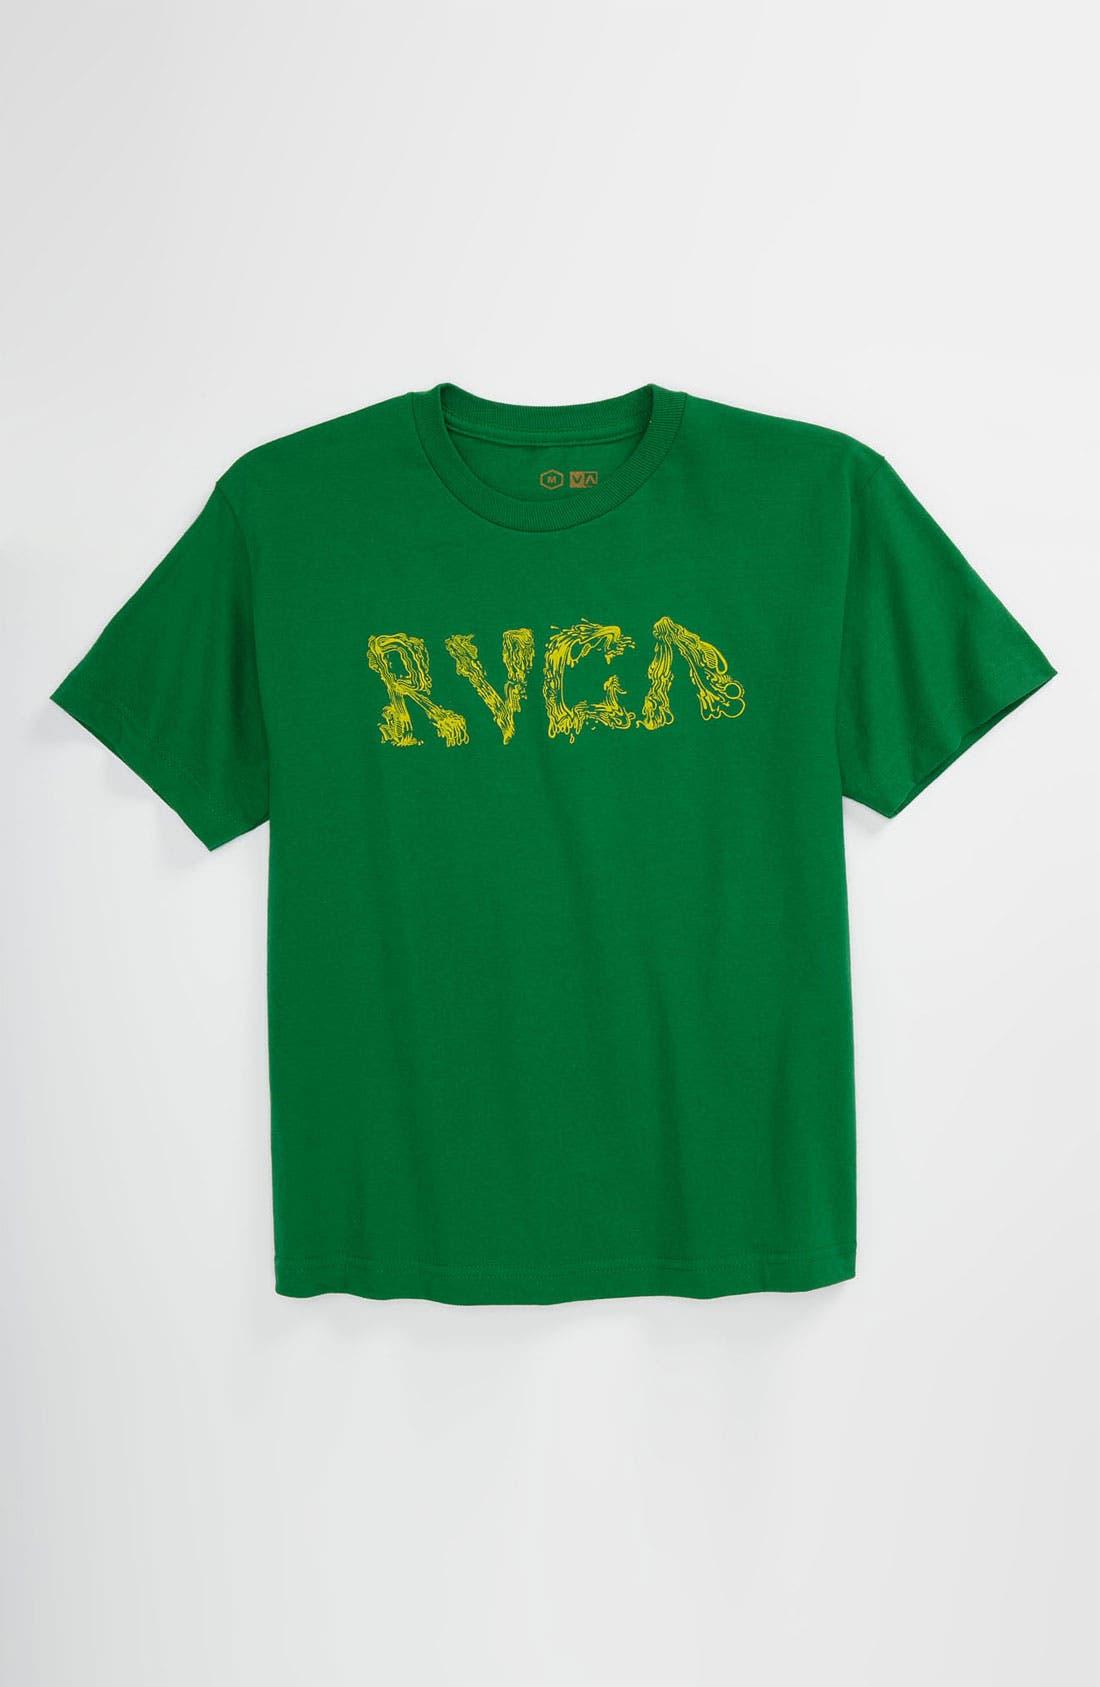 Alternate Image 1 Selected - RVCA 'Goo' T-Shirt (Big Boys)